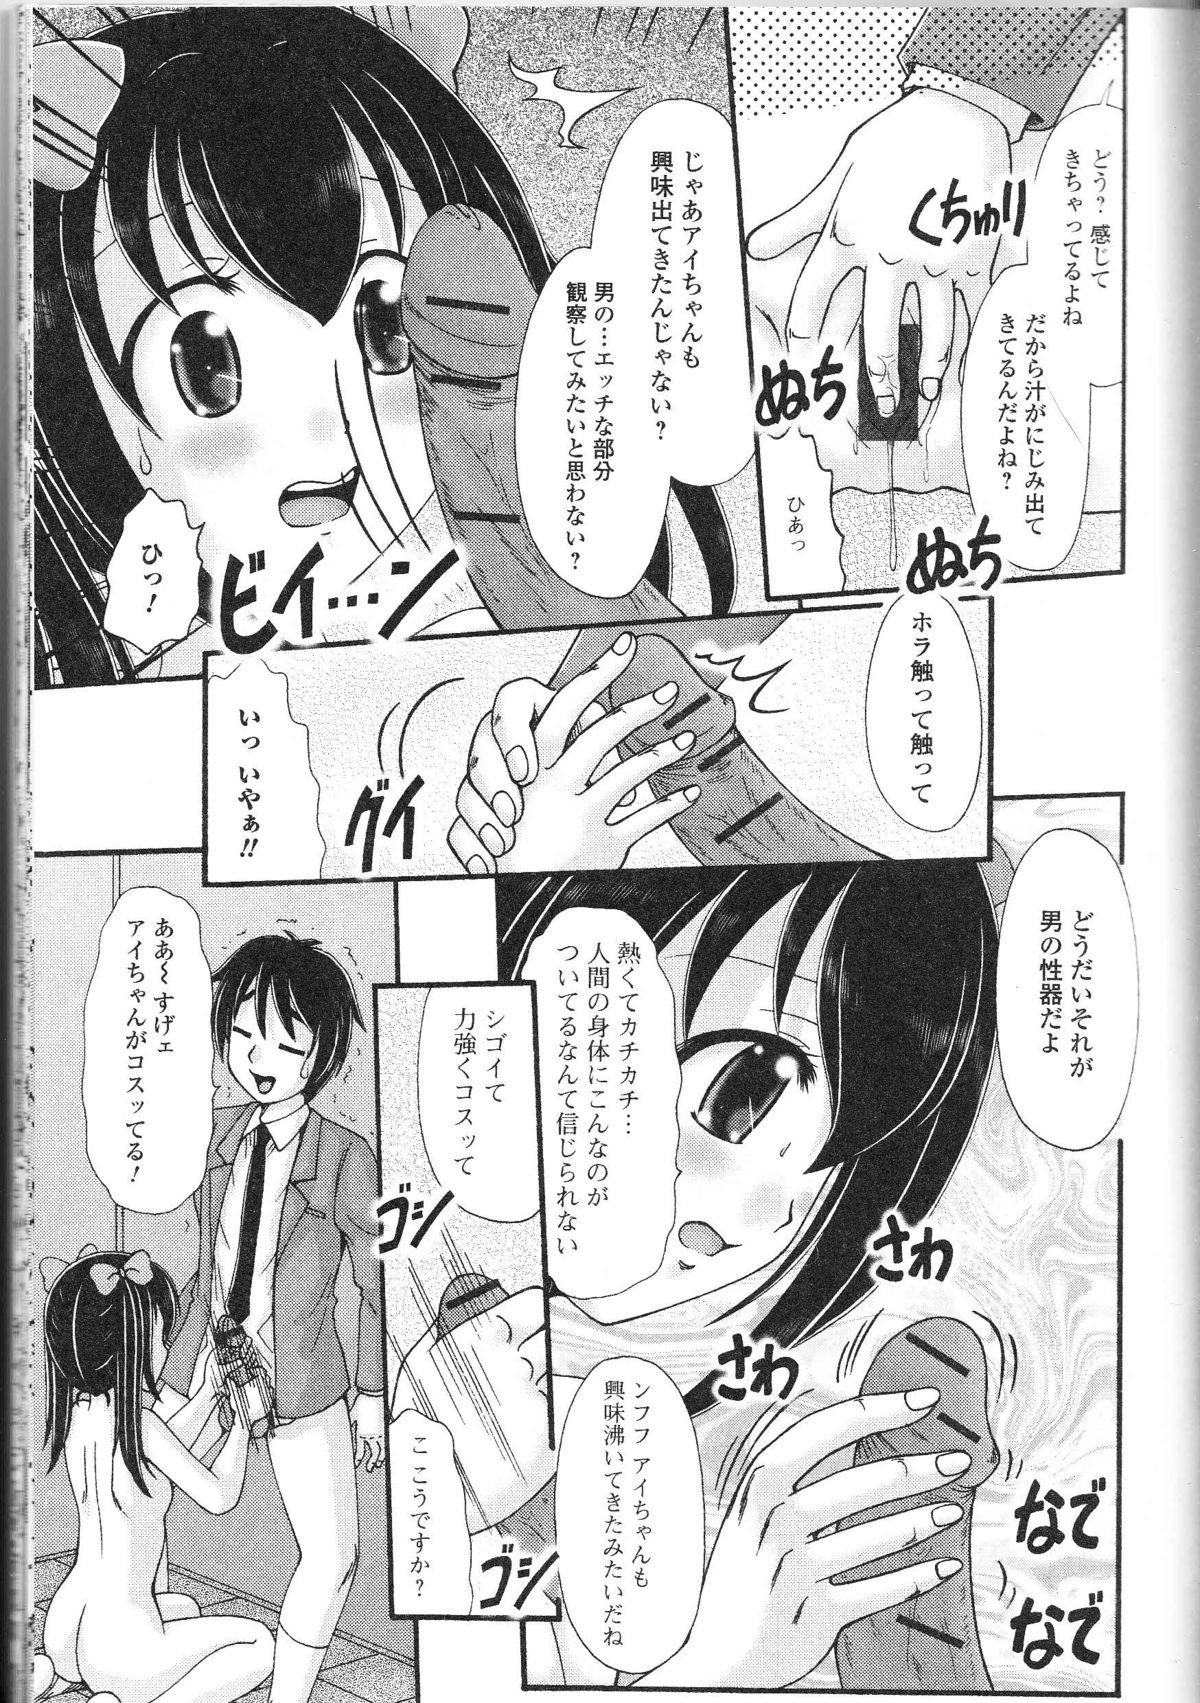 Nozoite wa Ikenai 9 - Do Not Peep! 9 133